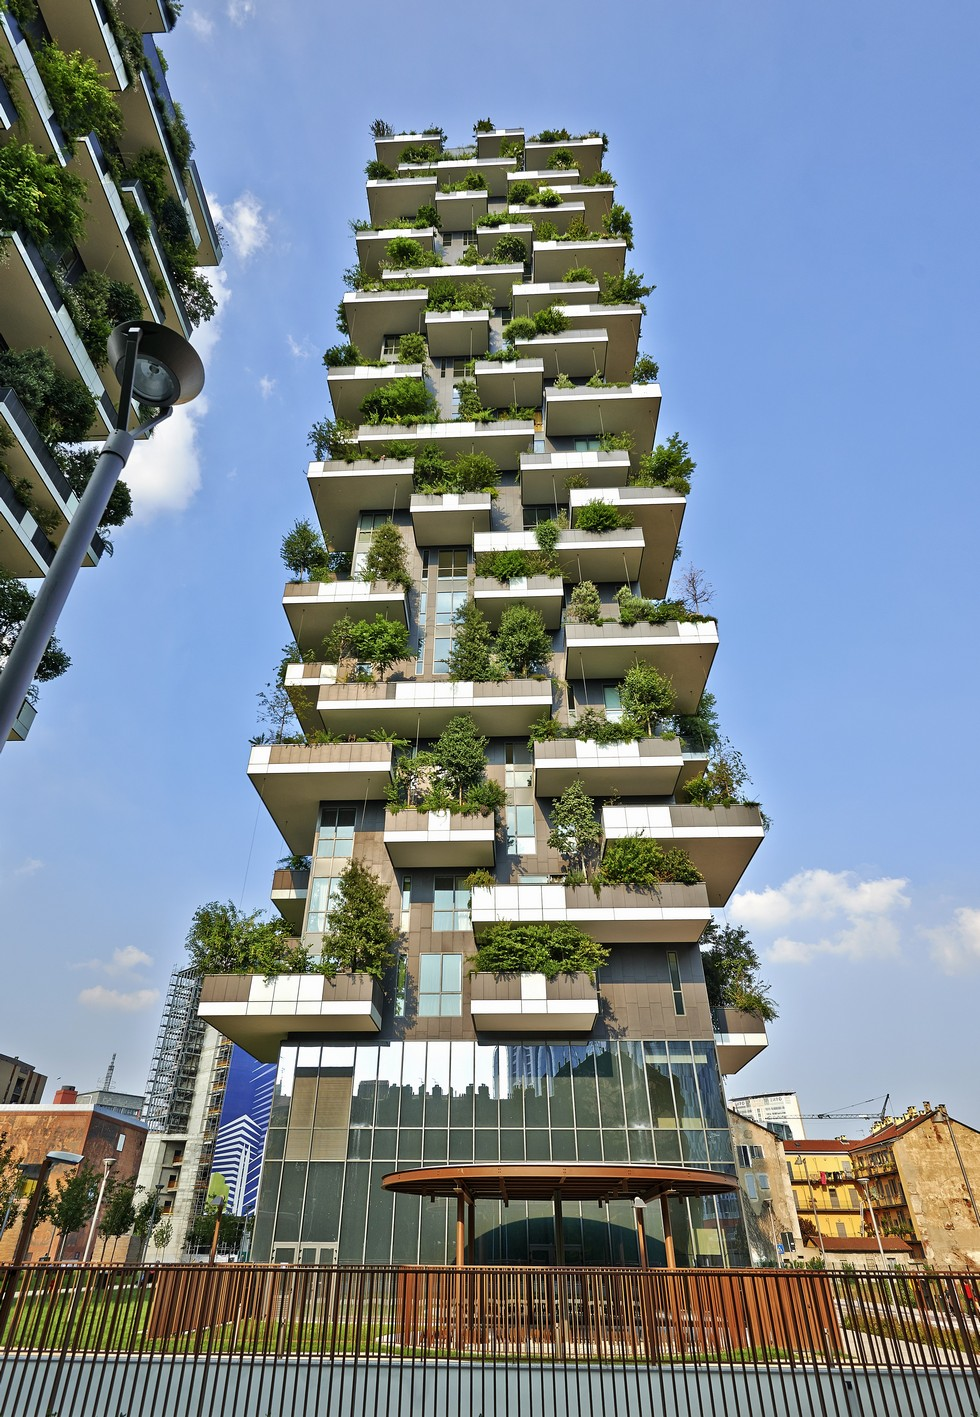 Milan - Vertical Forest Tower - Architect Stefano Boeri